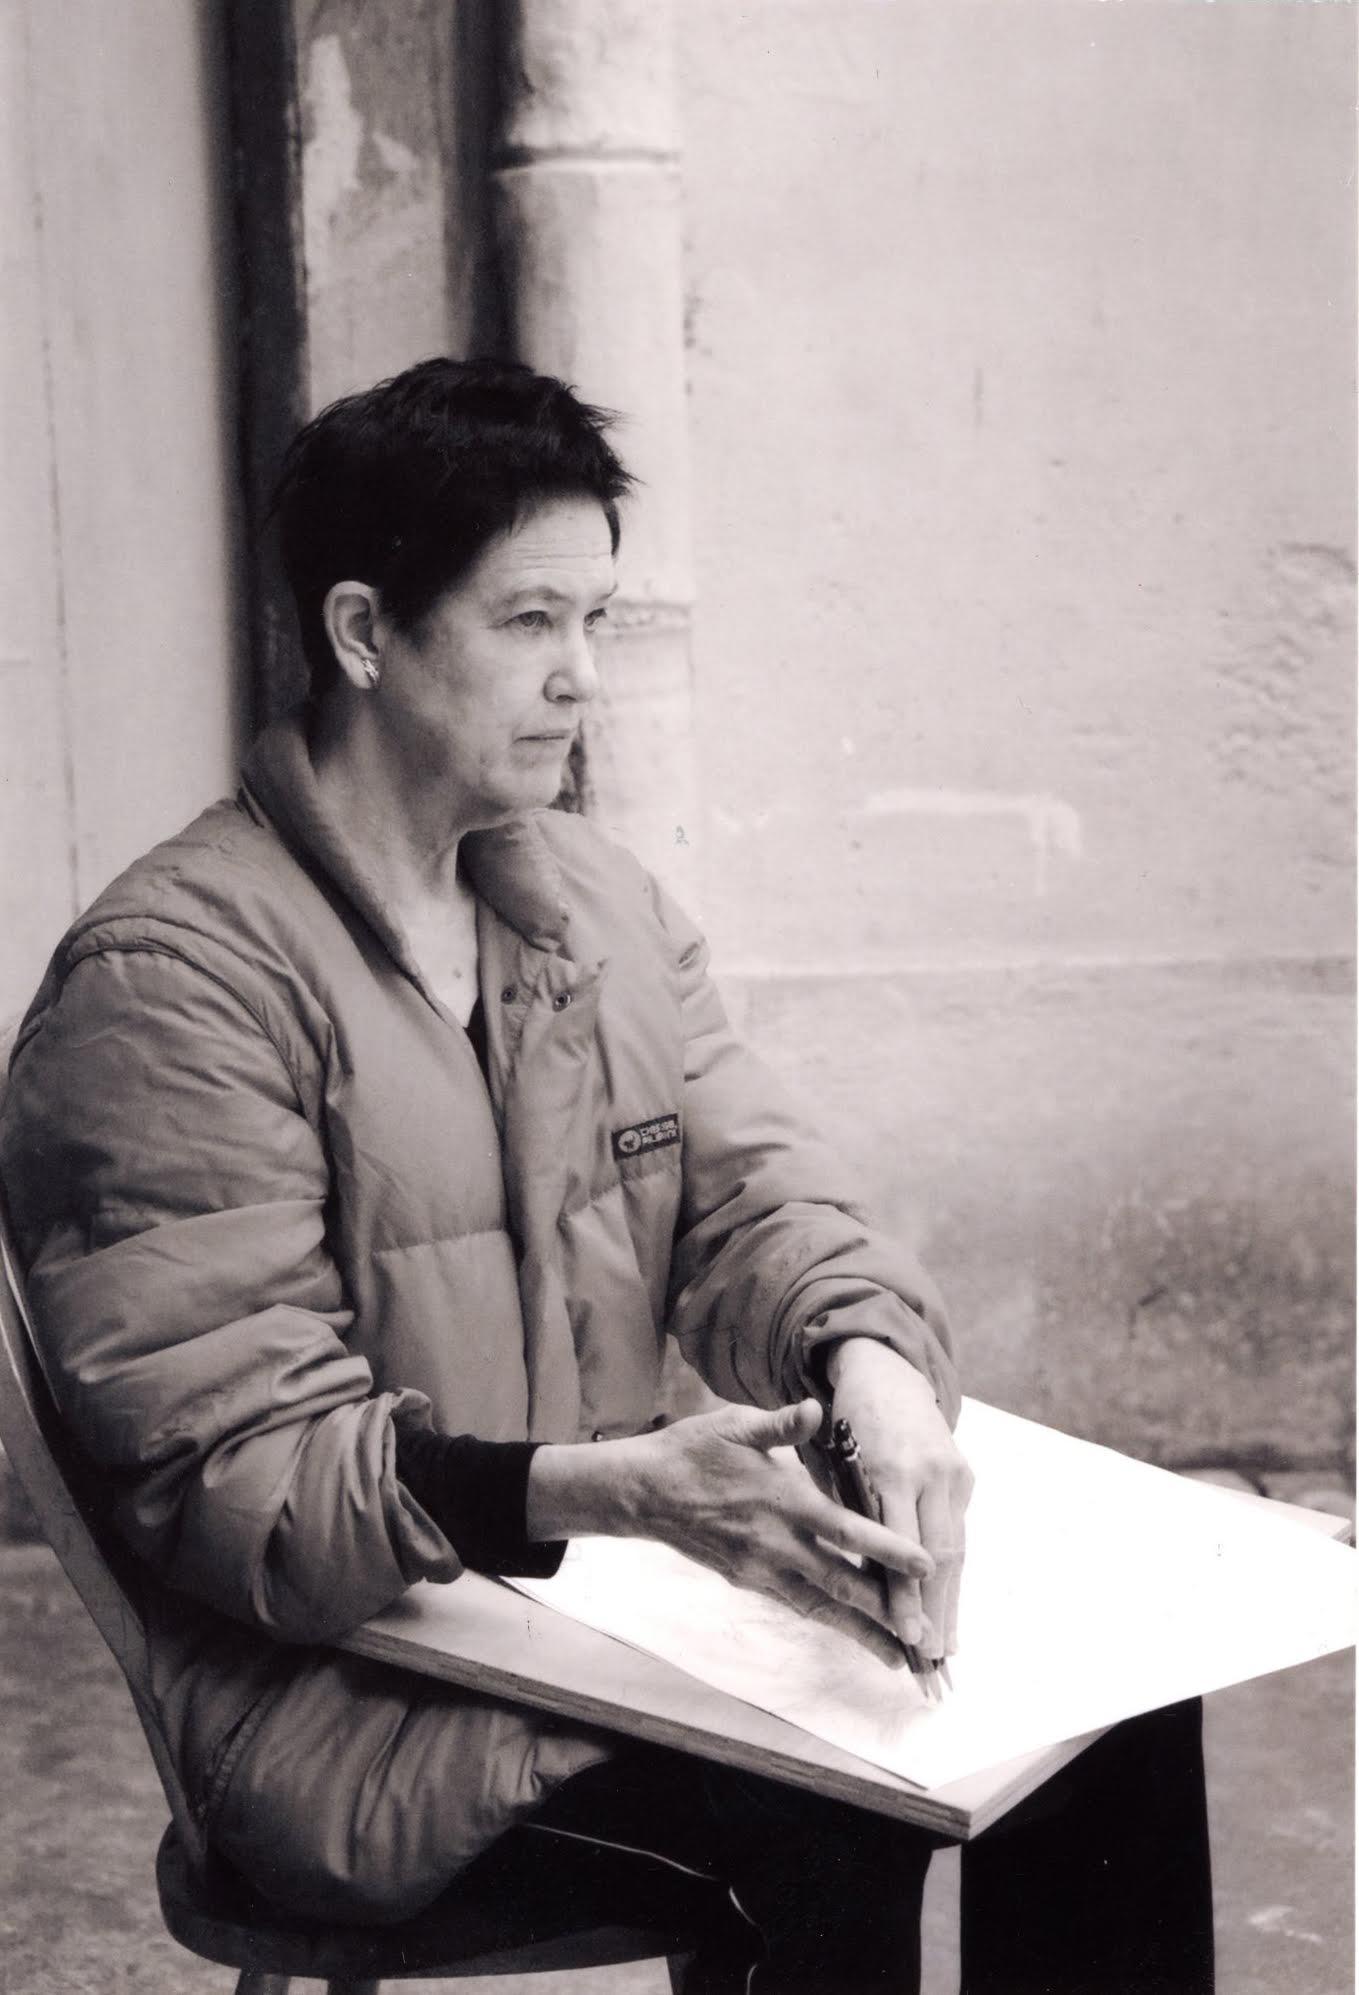 Morgan O'Hara Draw An Old Man Sweeping Leaves at the courtyard of Albergue SCM, Macau, 2009. Photograph by Frank Lei. Courtesy Albergue SCM  摩根·奥哈拉描绘澳门婆仔屋前院老人清扫树叶的轨迹,2009. 摄影:Frank Lei. 致谢婆仔屋文创空间